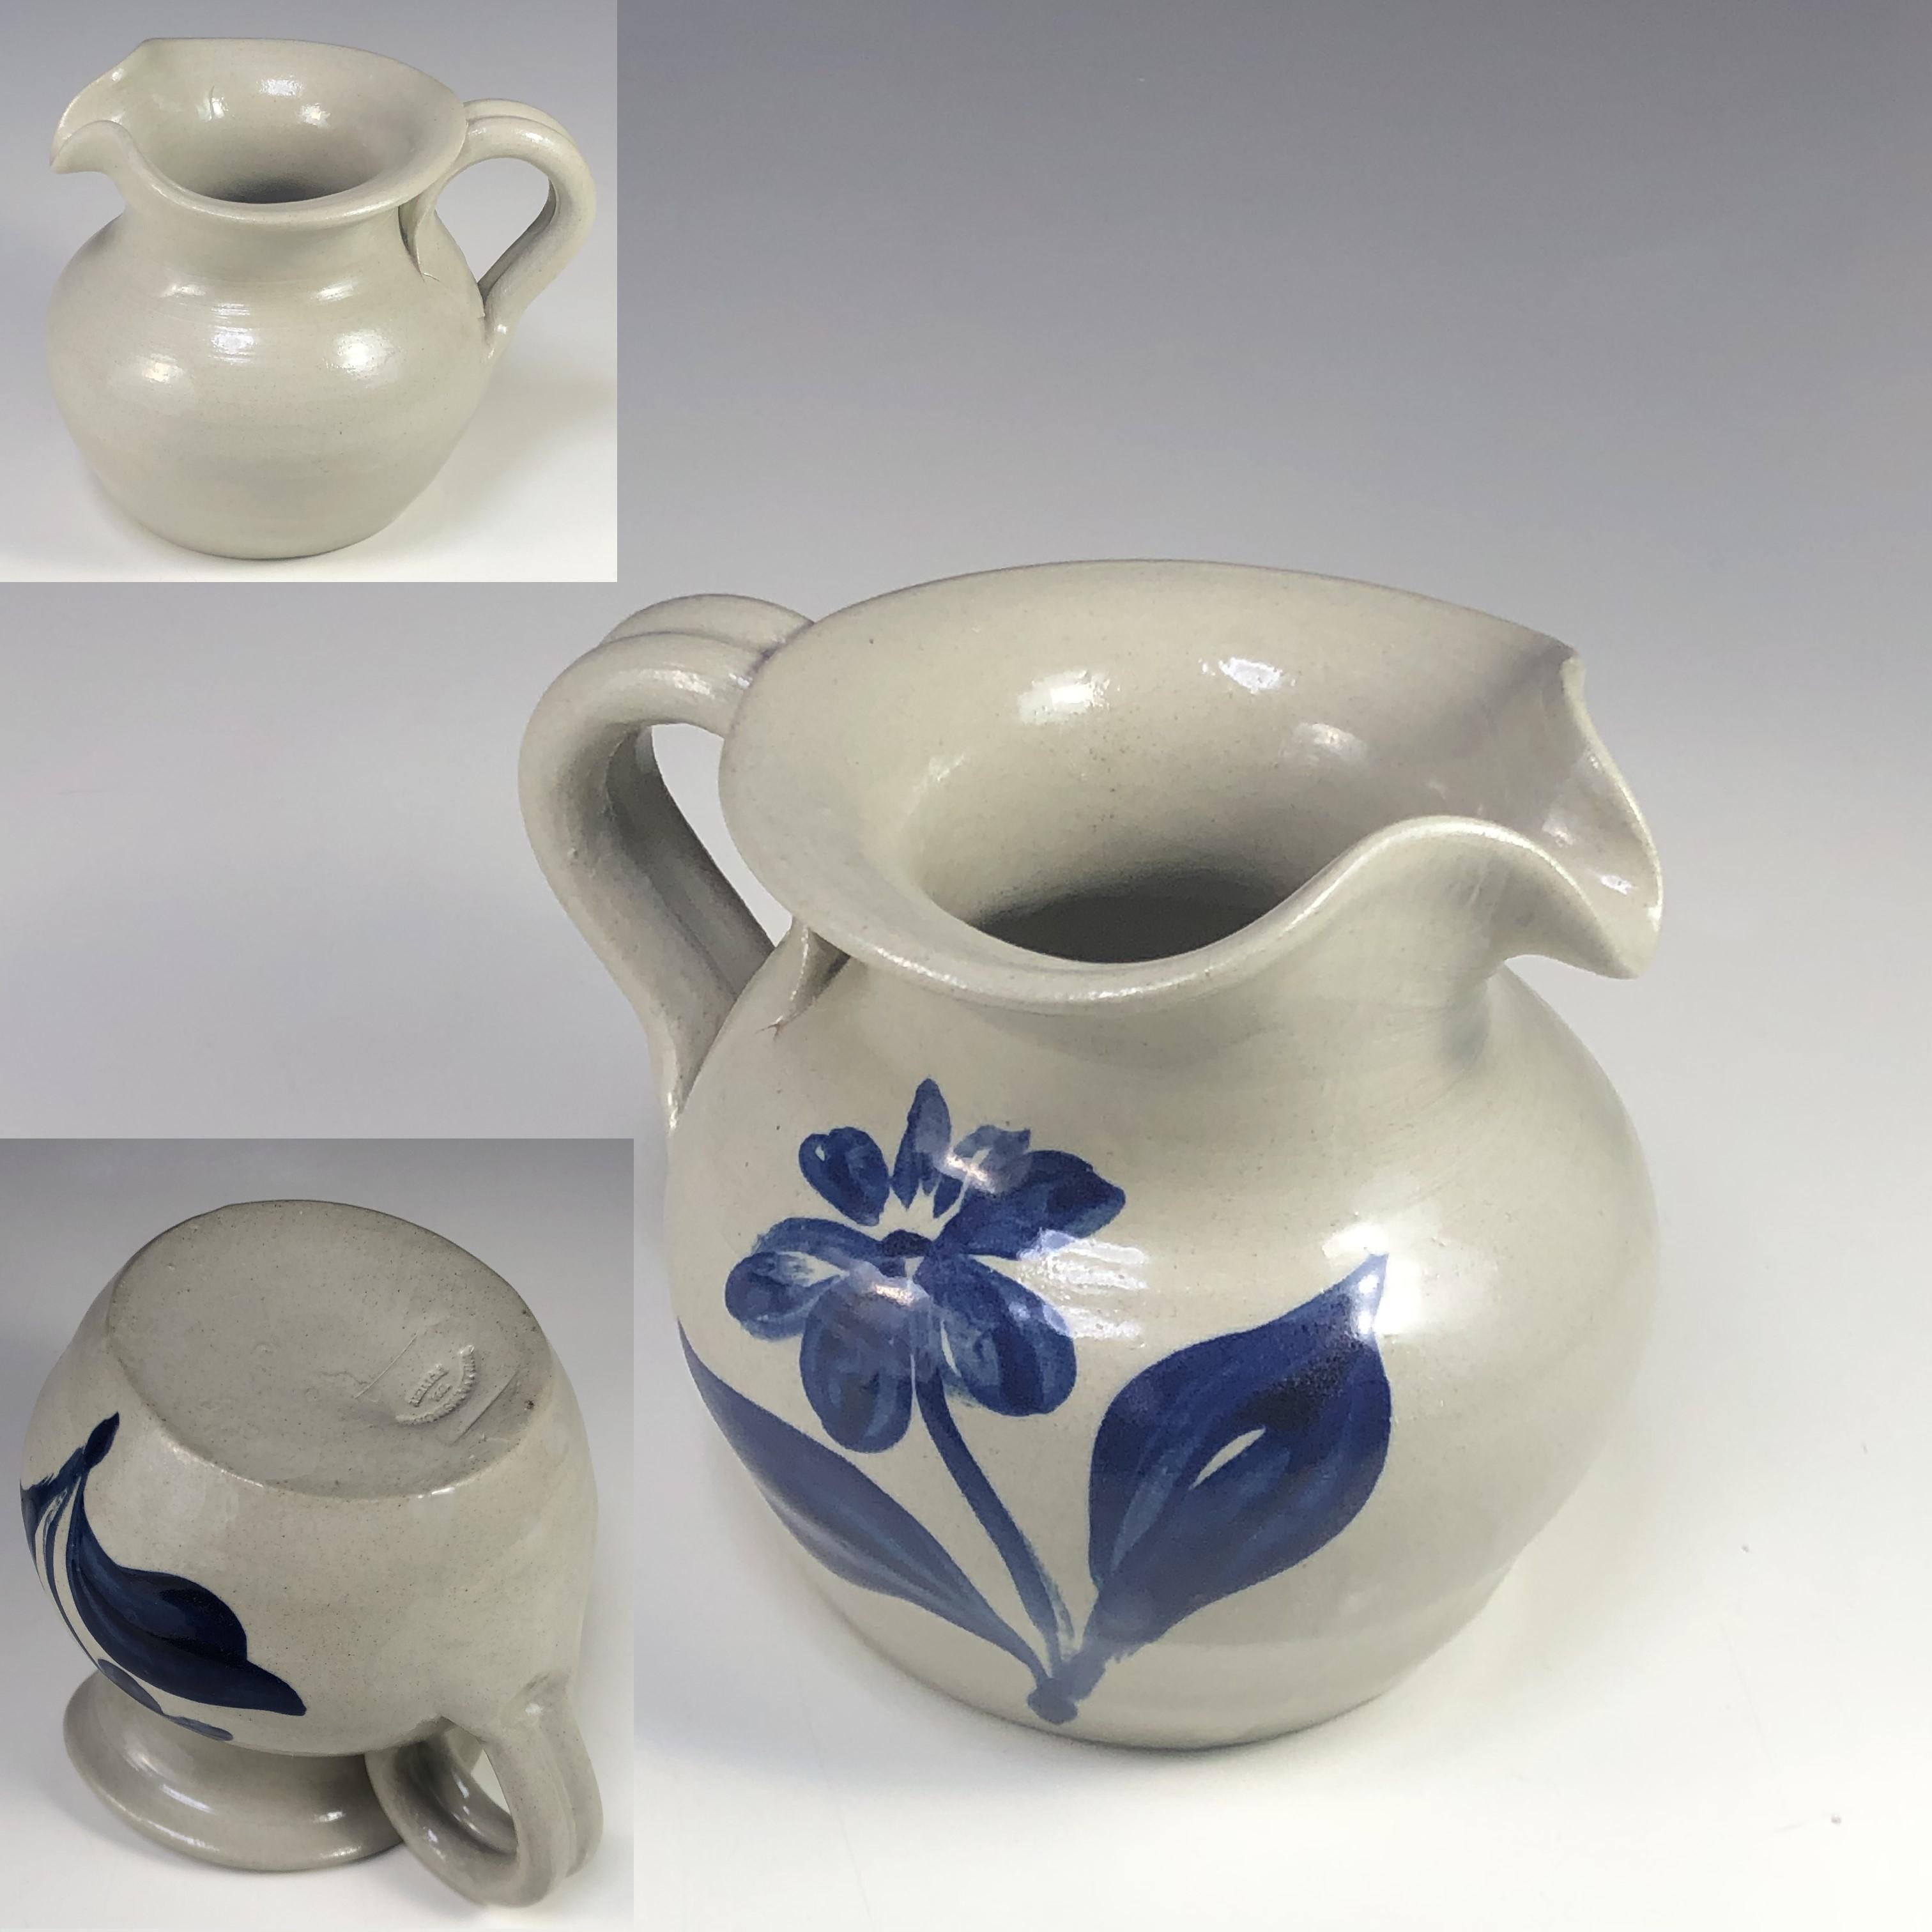 Williamsburg Pottery クリーマーT2032